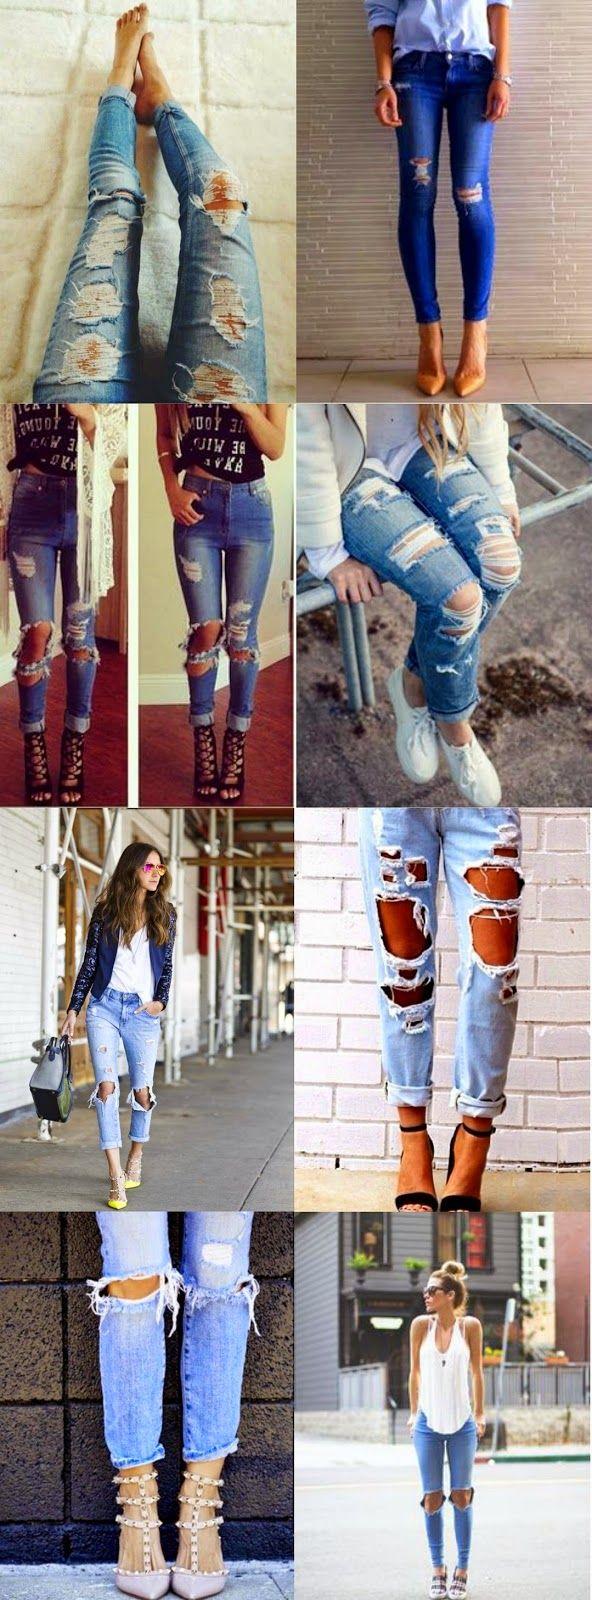 Best 25+ Diy ripped jeans ideas on Pinterest | DIY fashion ripped jeans Diy jeans and DIY ...